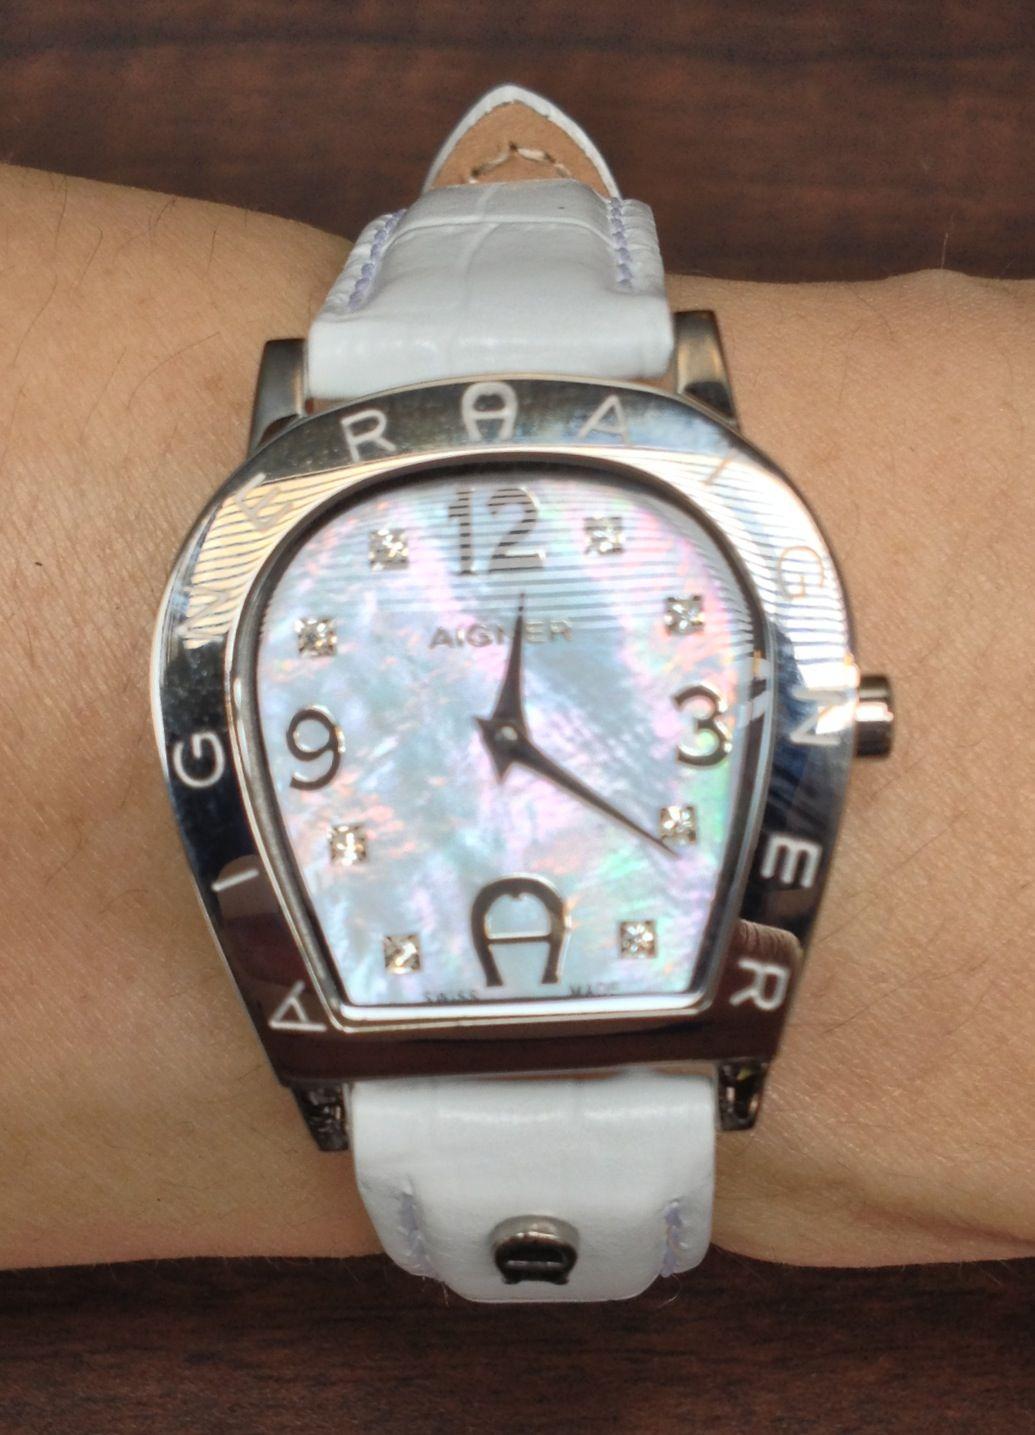 Aigner Jam Tangan Wanita Quality Super Model Elegant Casua Leather A24265 Garda Coklat Rosegold Watch Digital All White